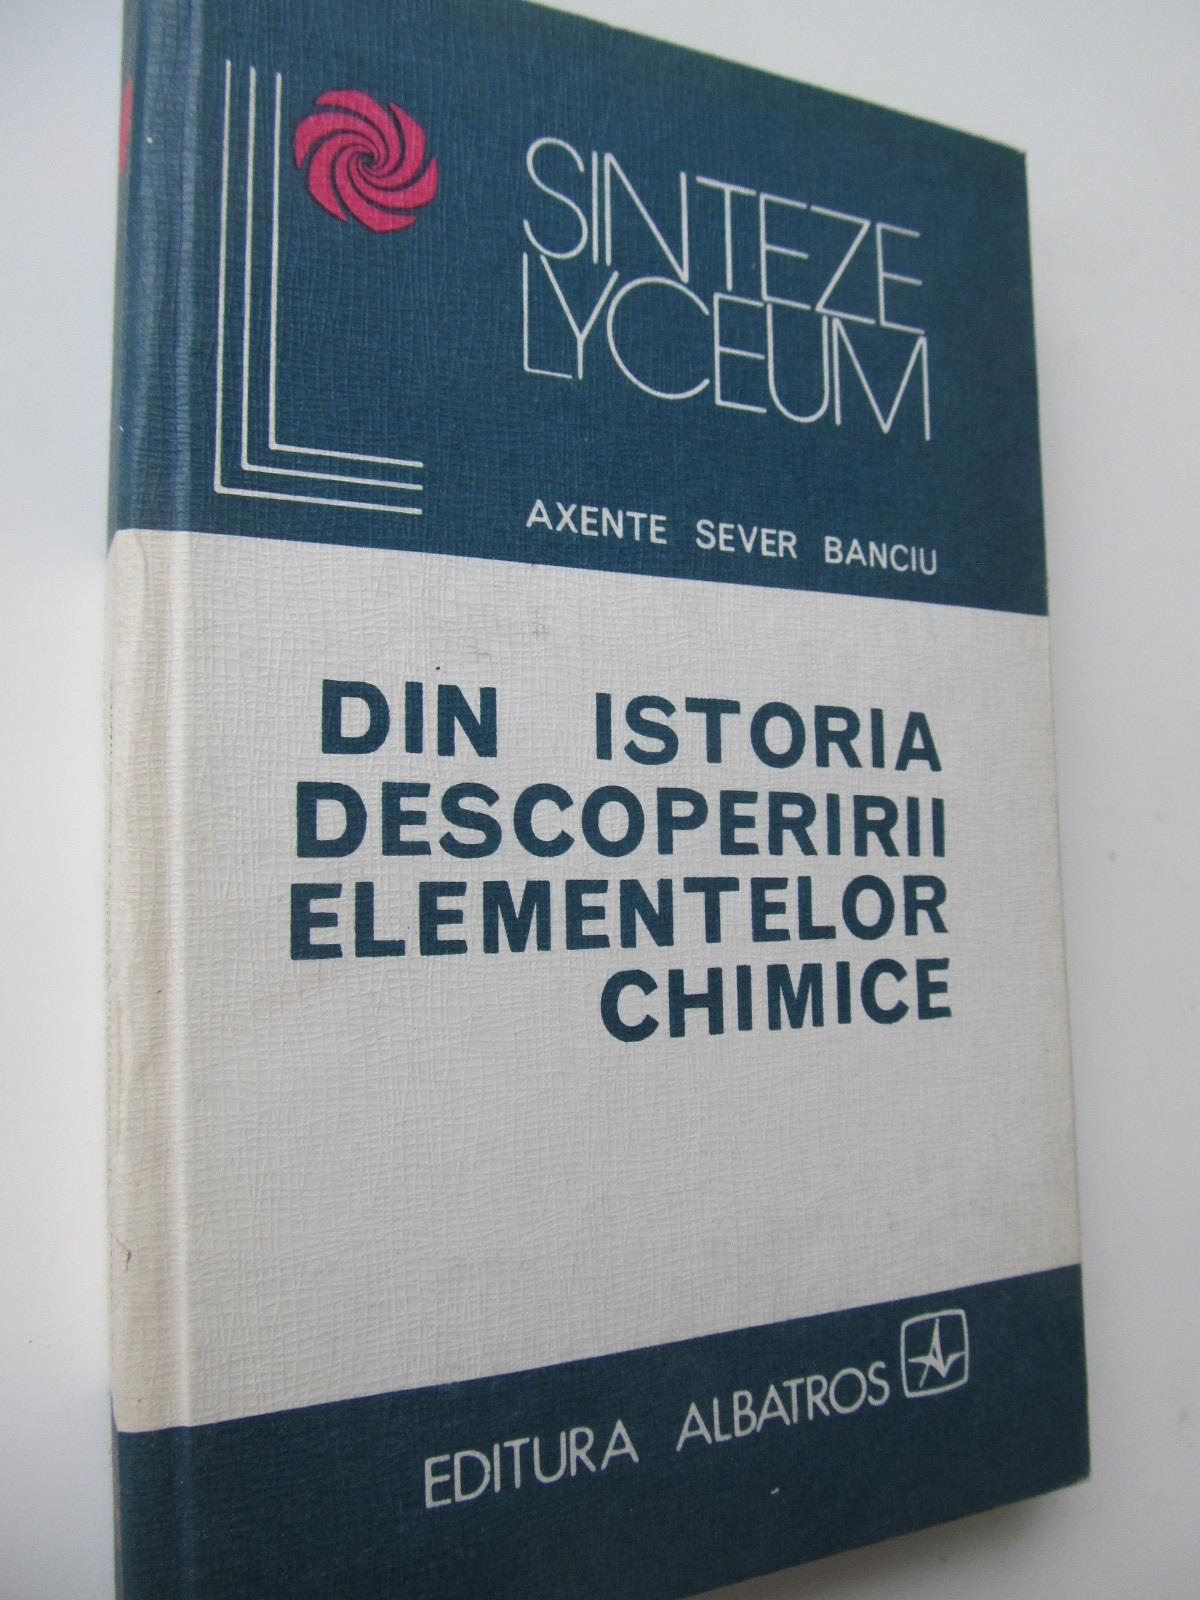 Din istoria descoperirilor elementelor chimice - Axente Sever Banciu | Detalii carte